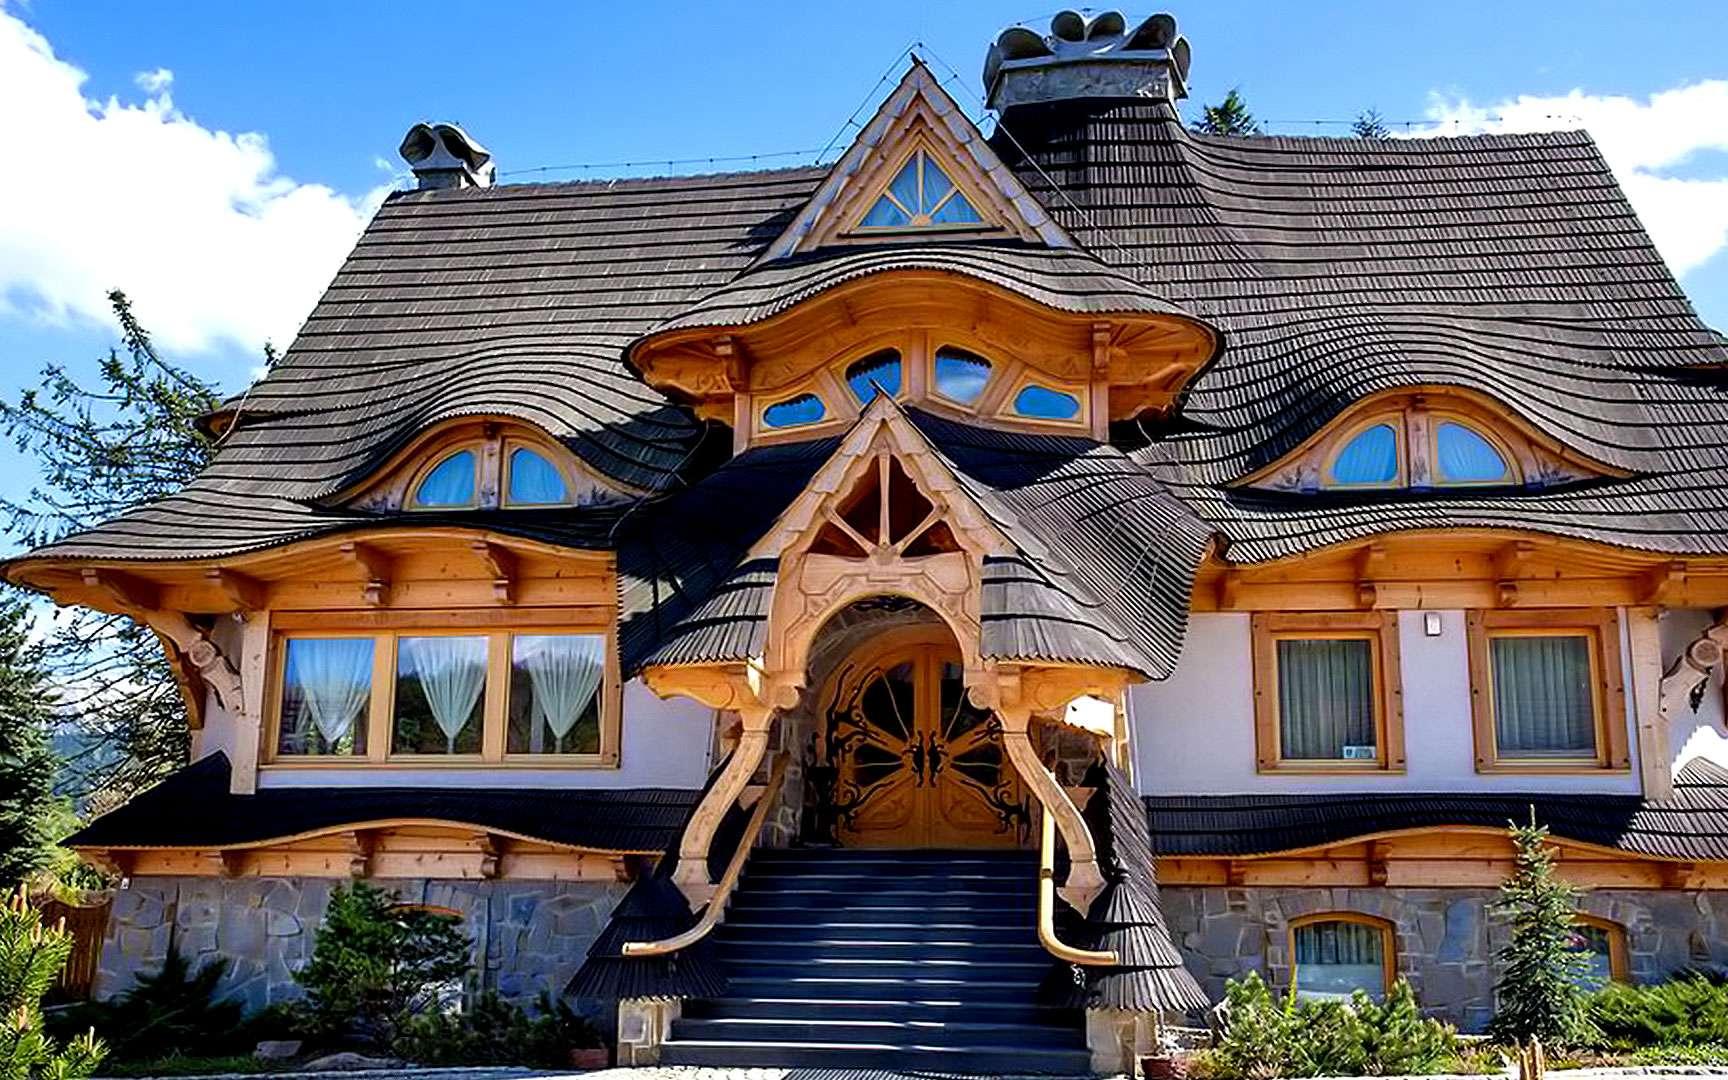 Maison en bois à Zakopane, dans le sud de la Pologne. © Benkamorvan, CC